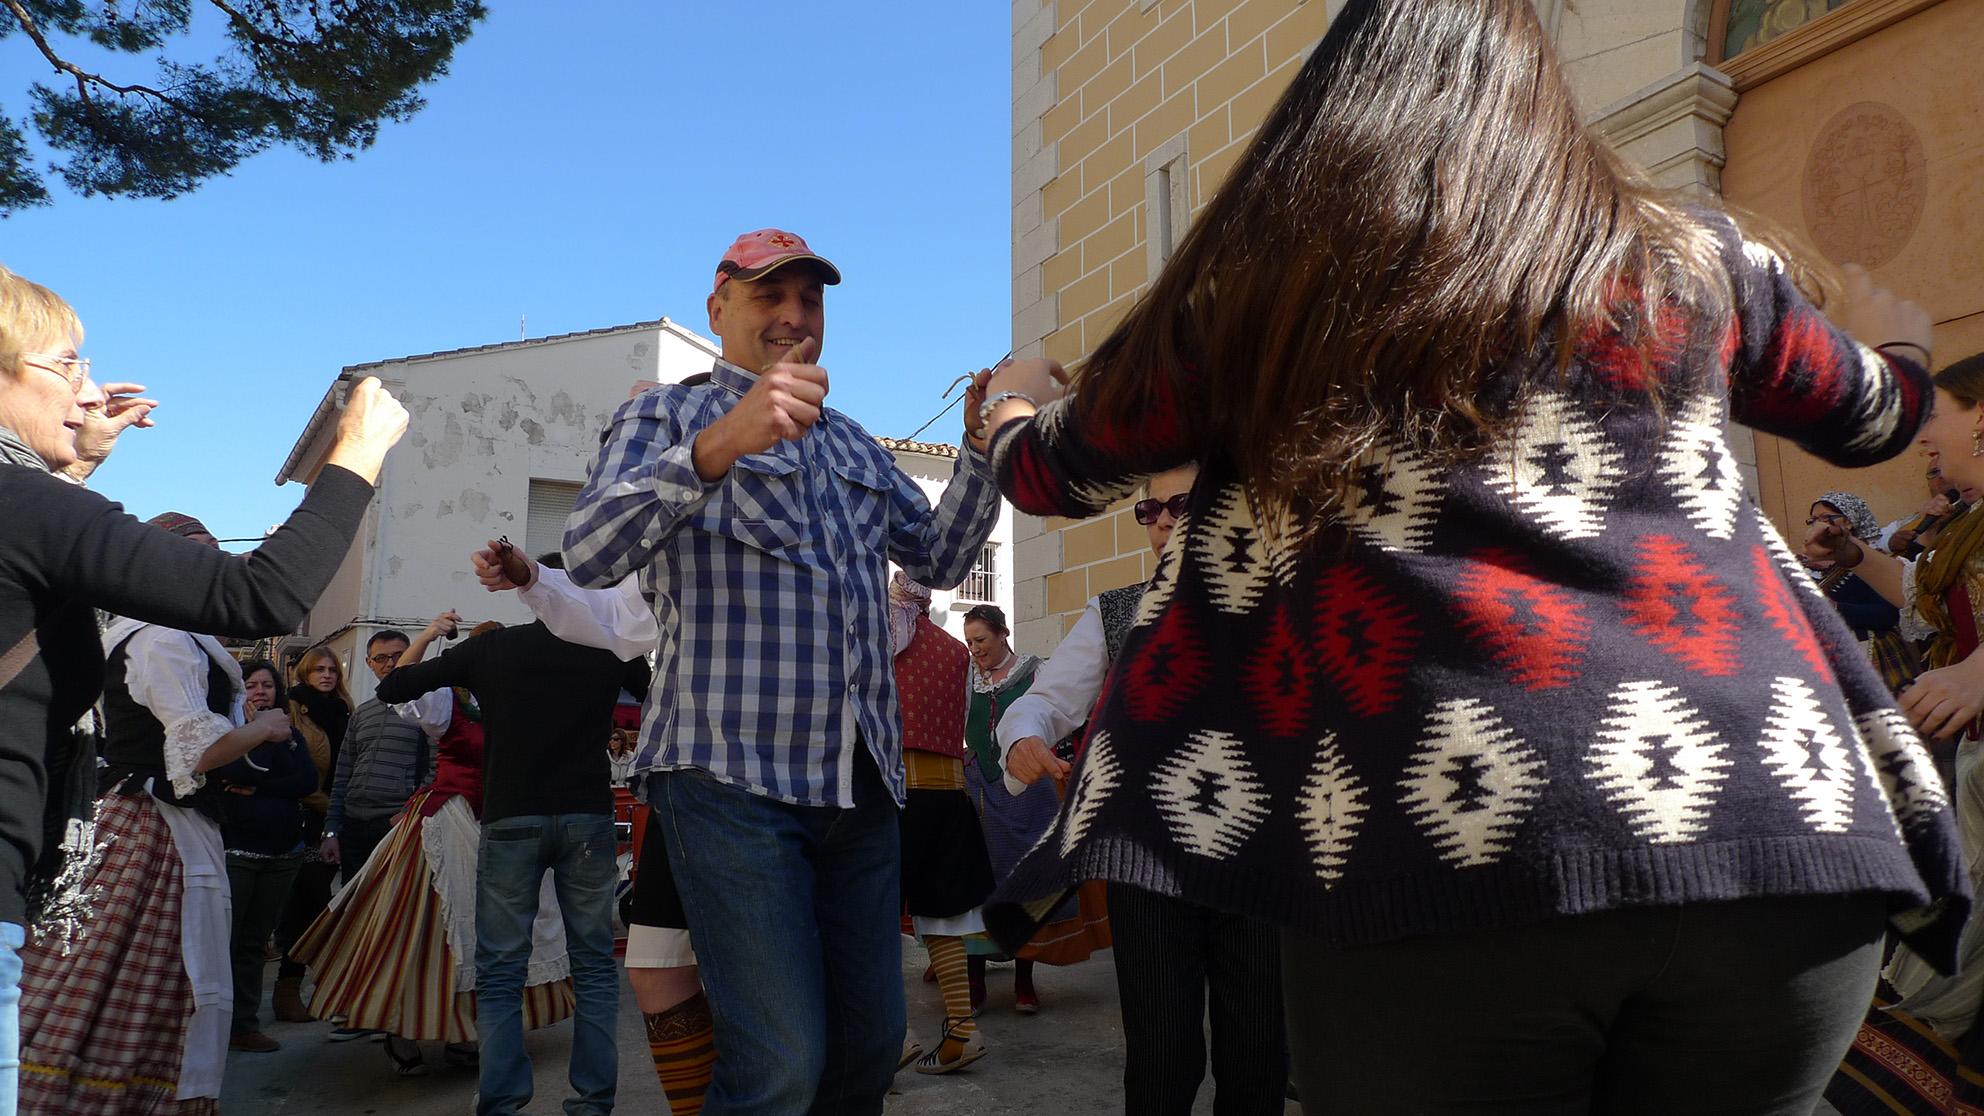 2014-02-23 - Baladre a Fira St. Marcia-ROTOVA (111)